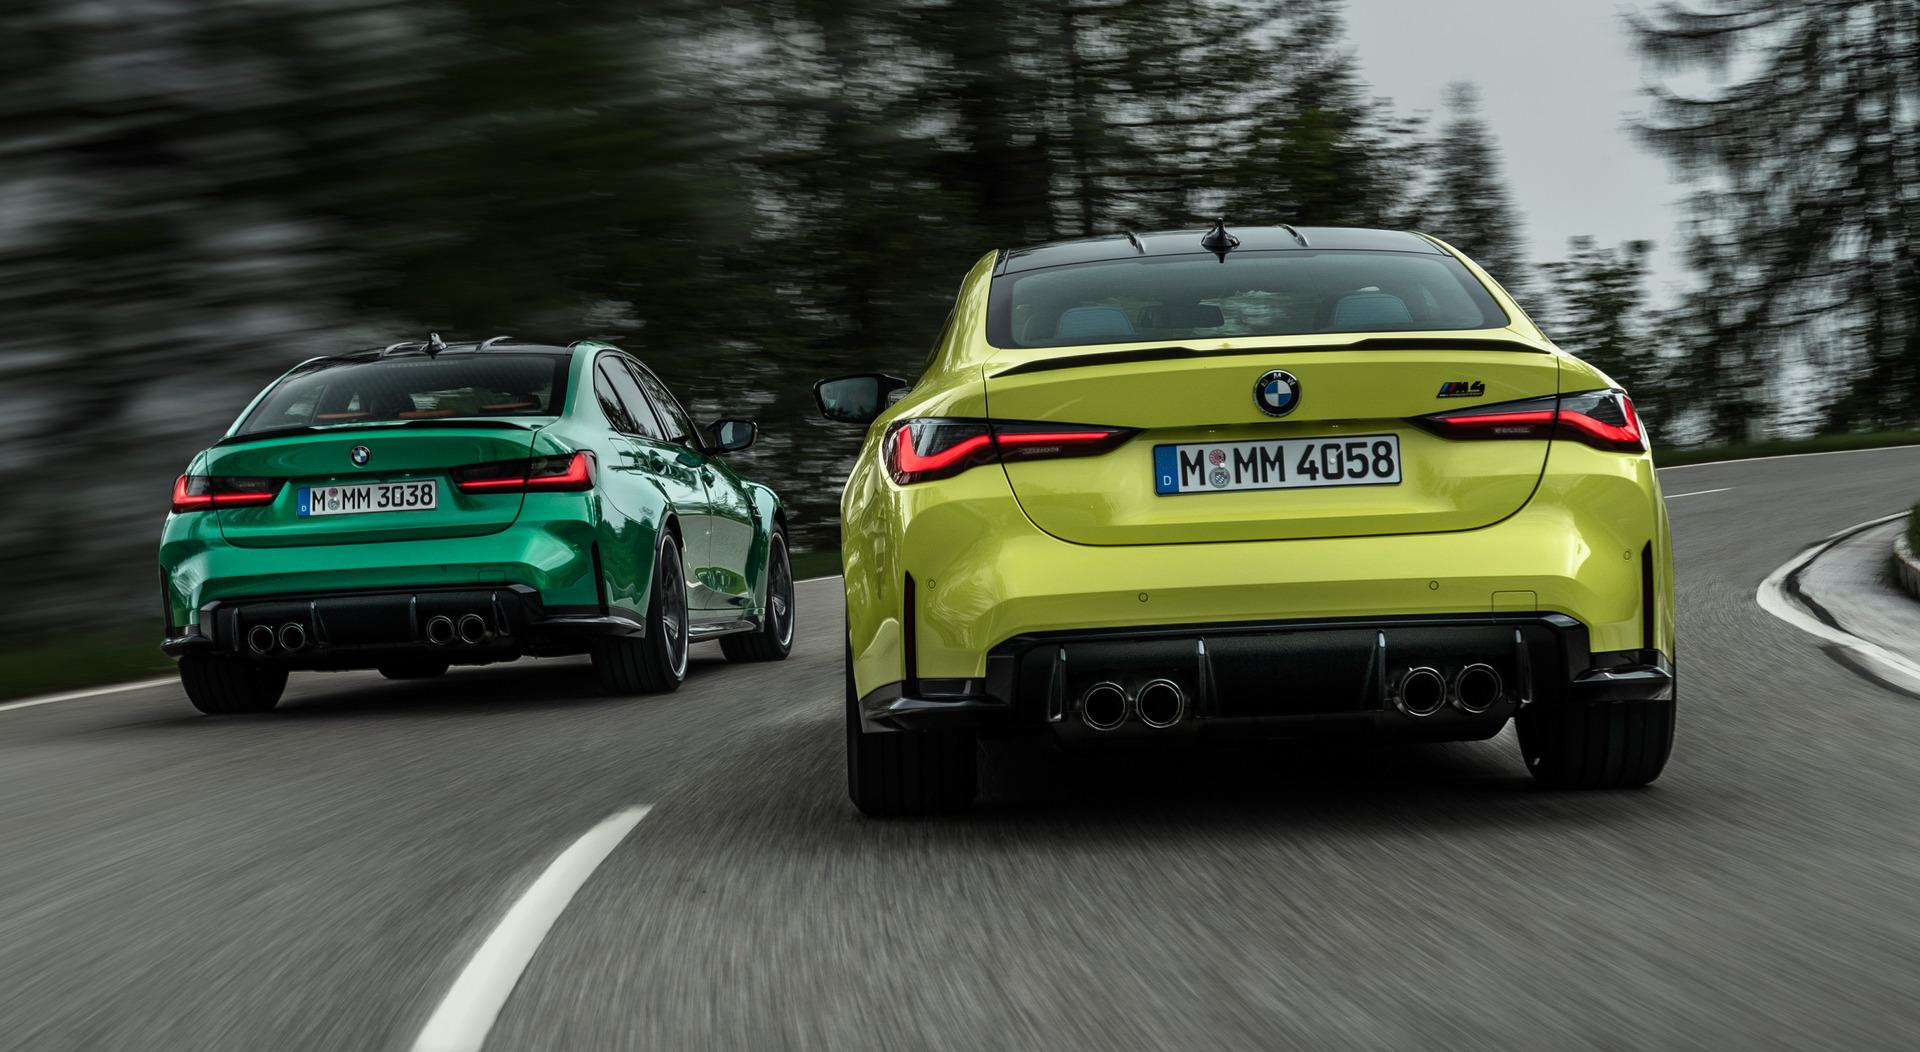 BMW M3 Sedan - BMW M4 Coupe